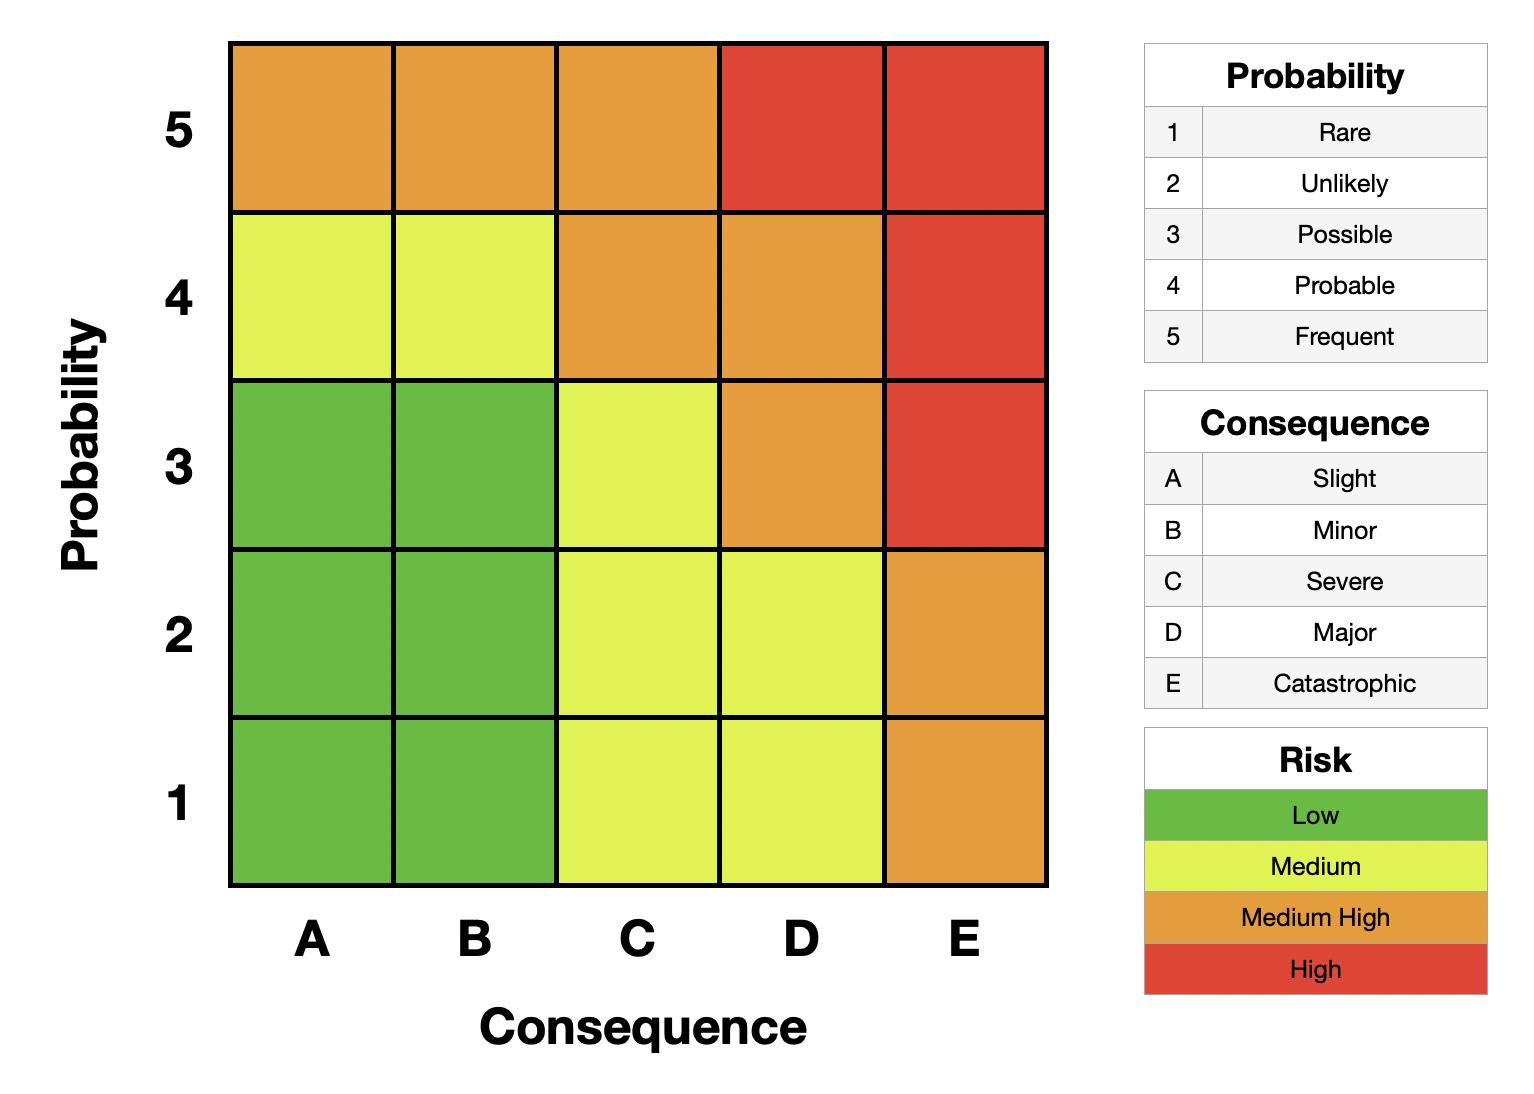 Figure 1. Unbalanced Risk Matrix Example.